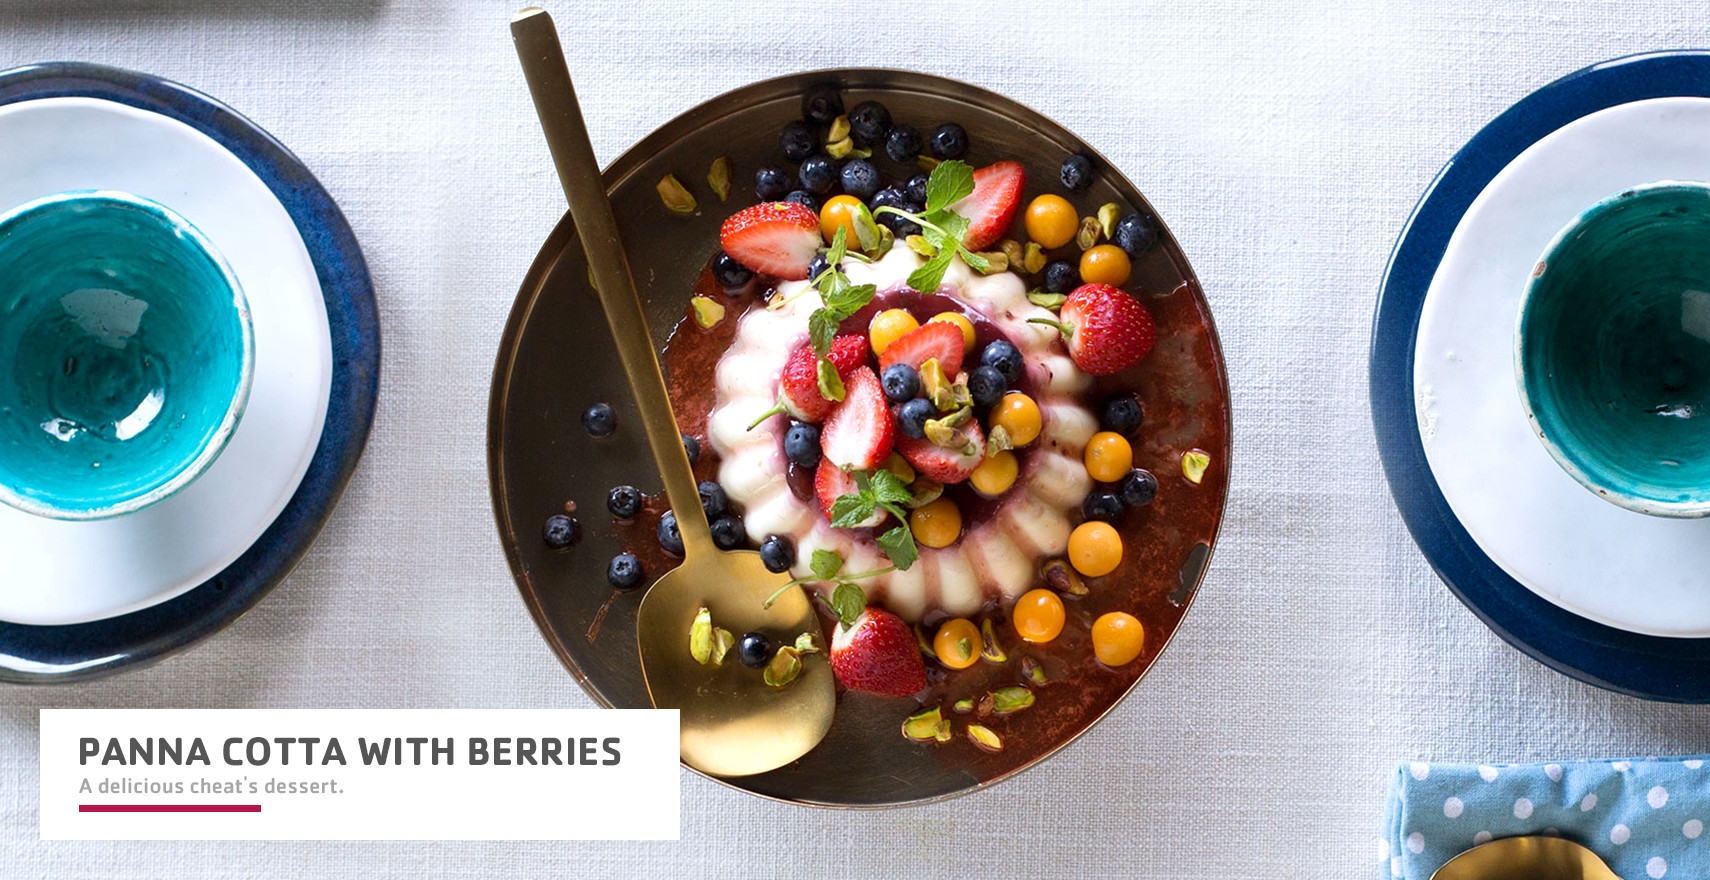 Berry panna cotta with boozy strawberries header image.jpg